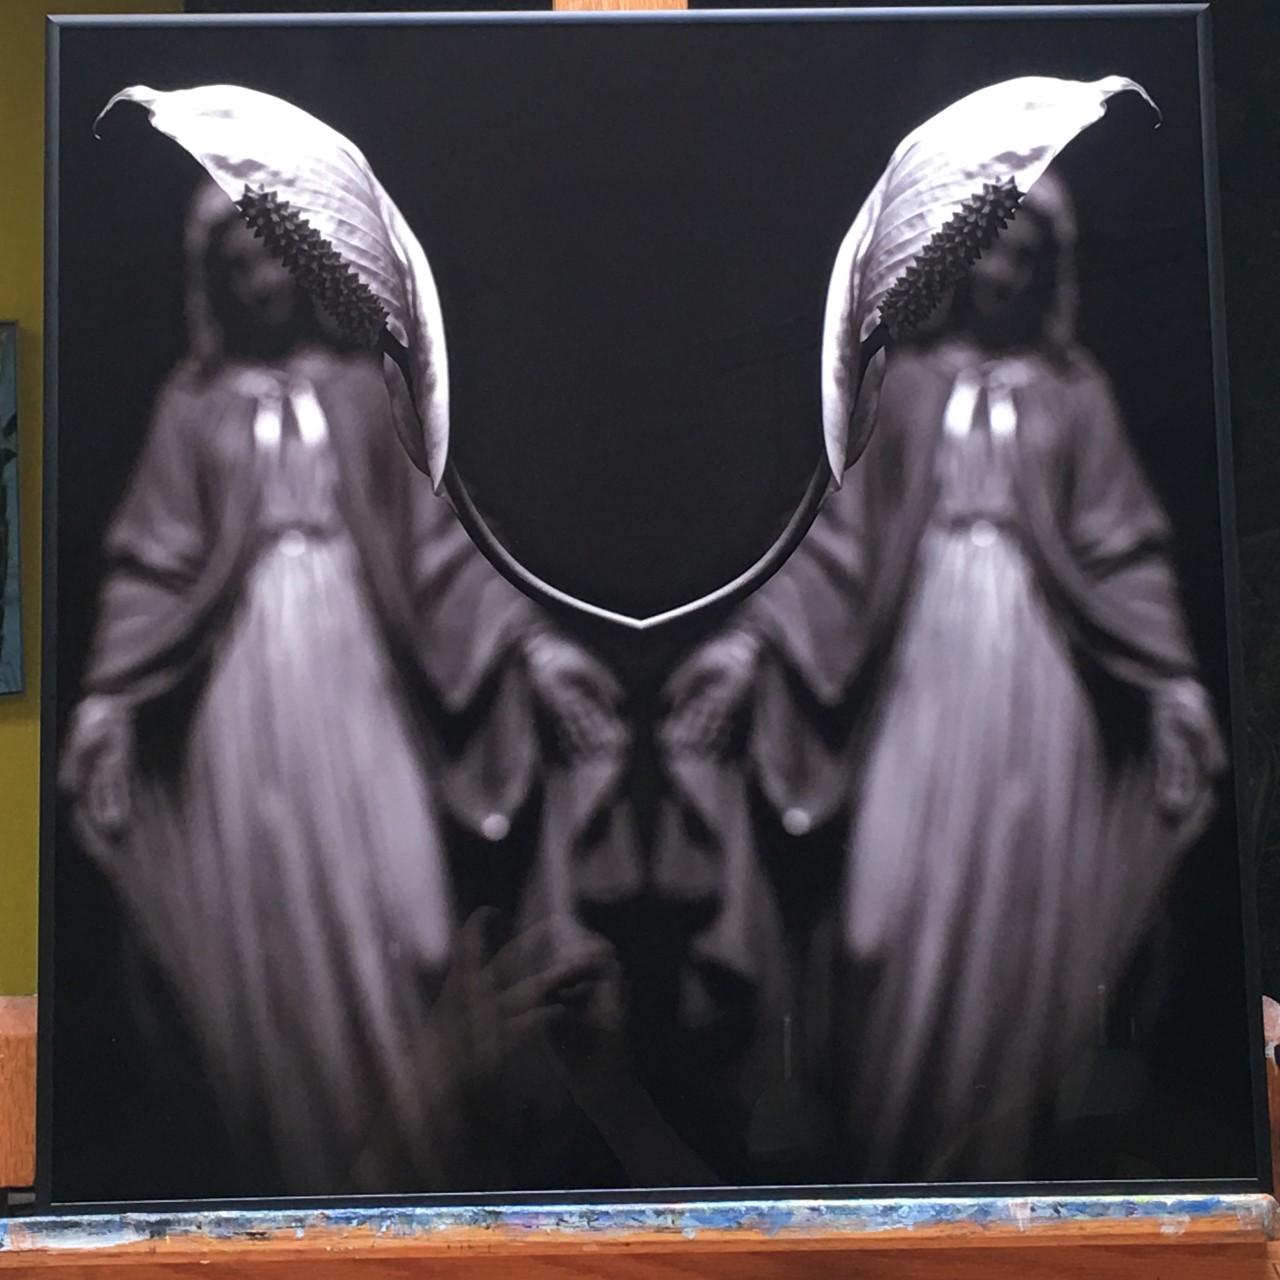 prendergast hd metal prints for art show